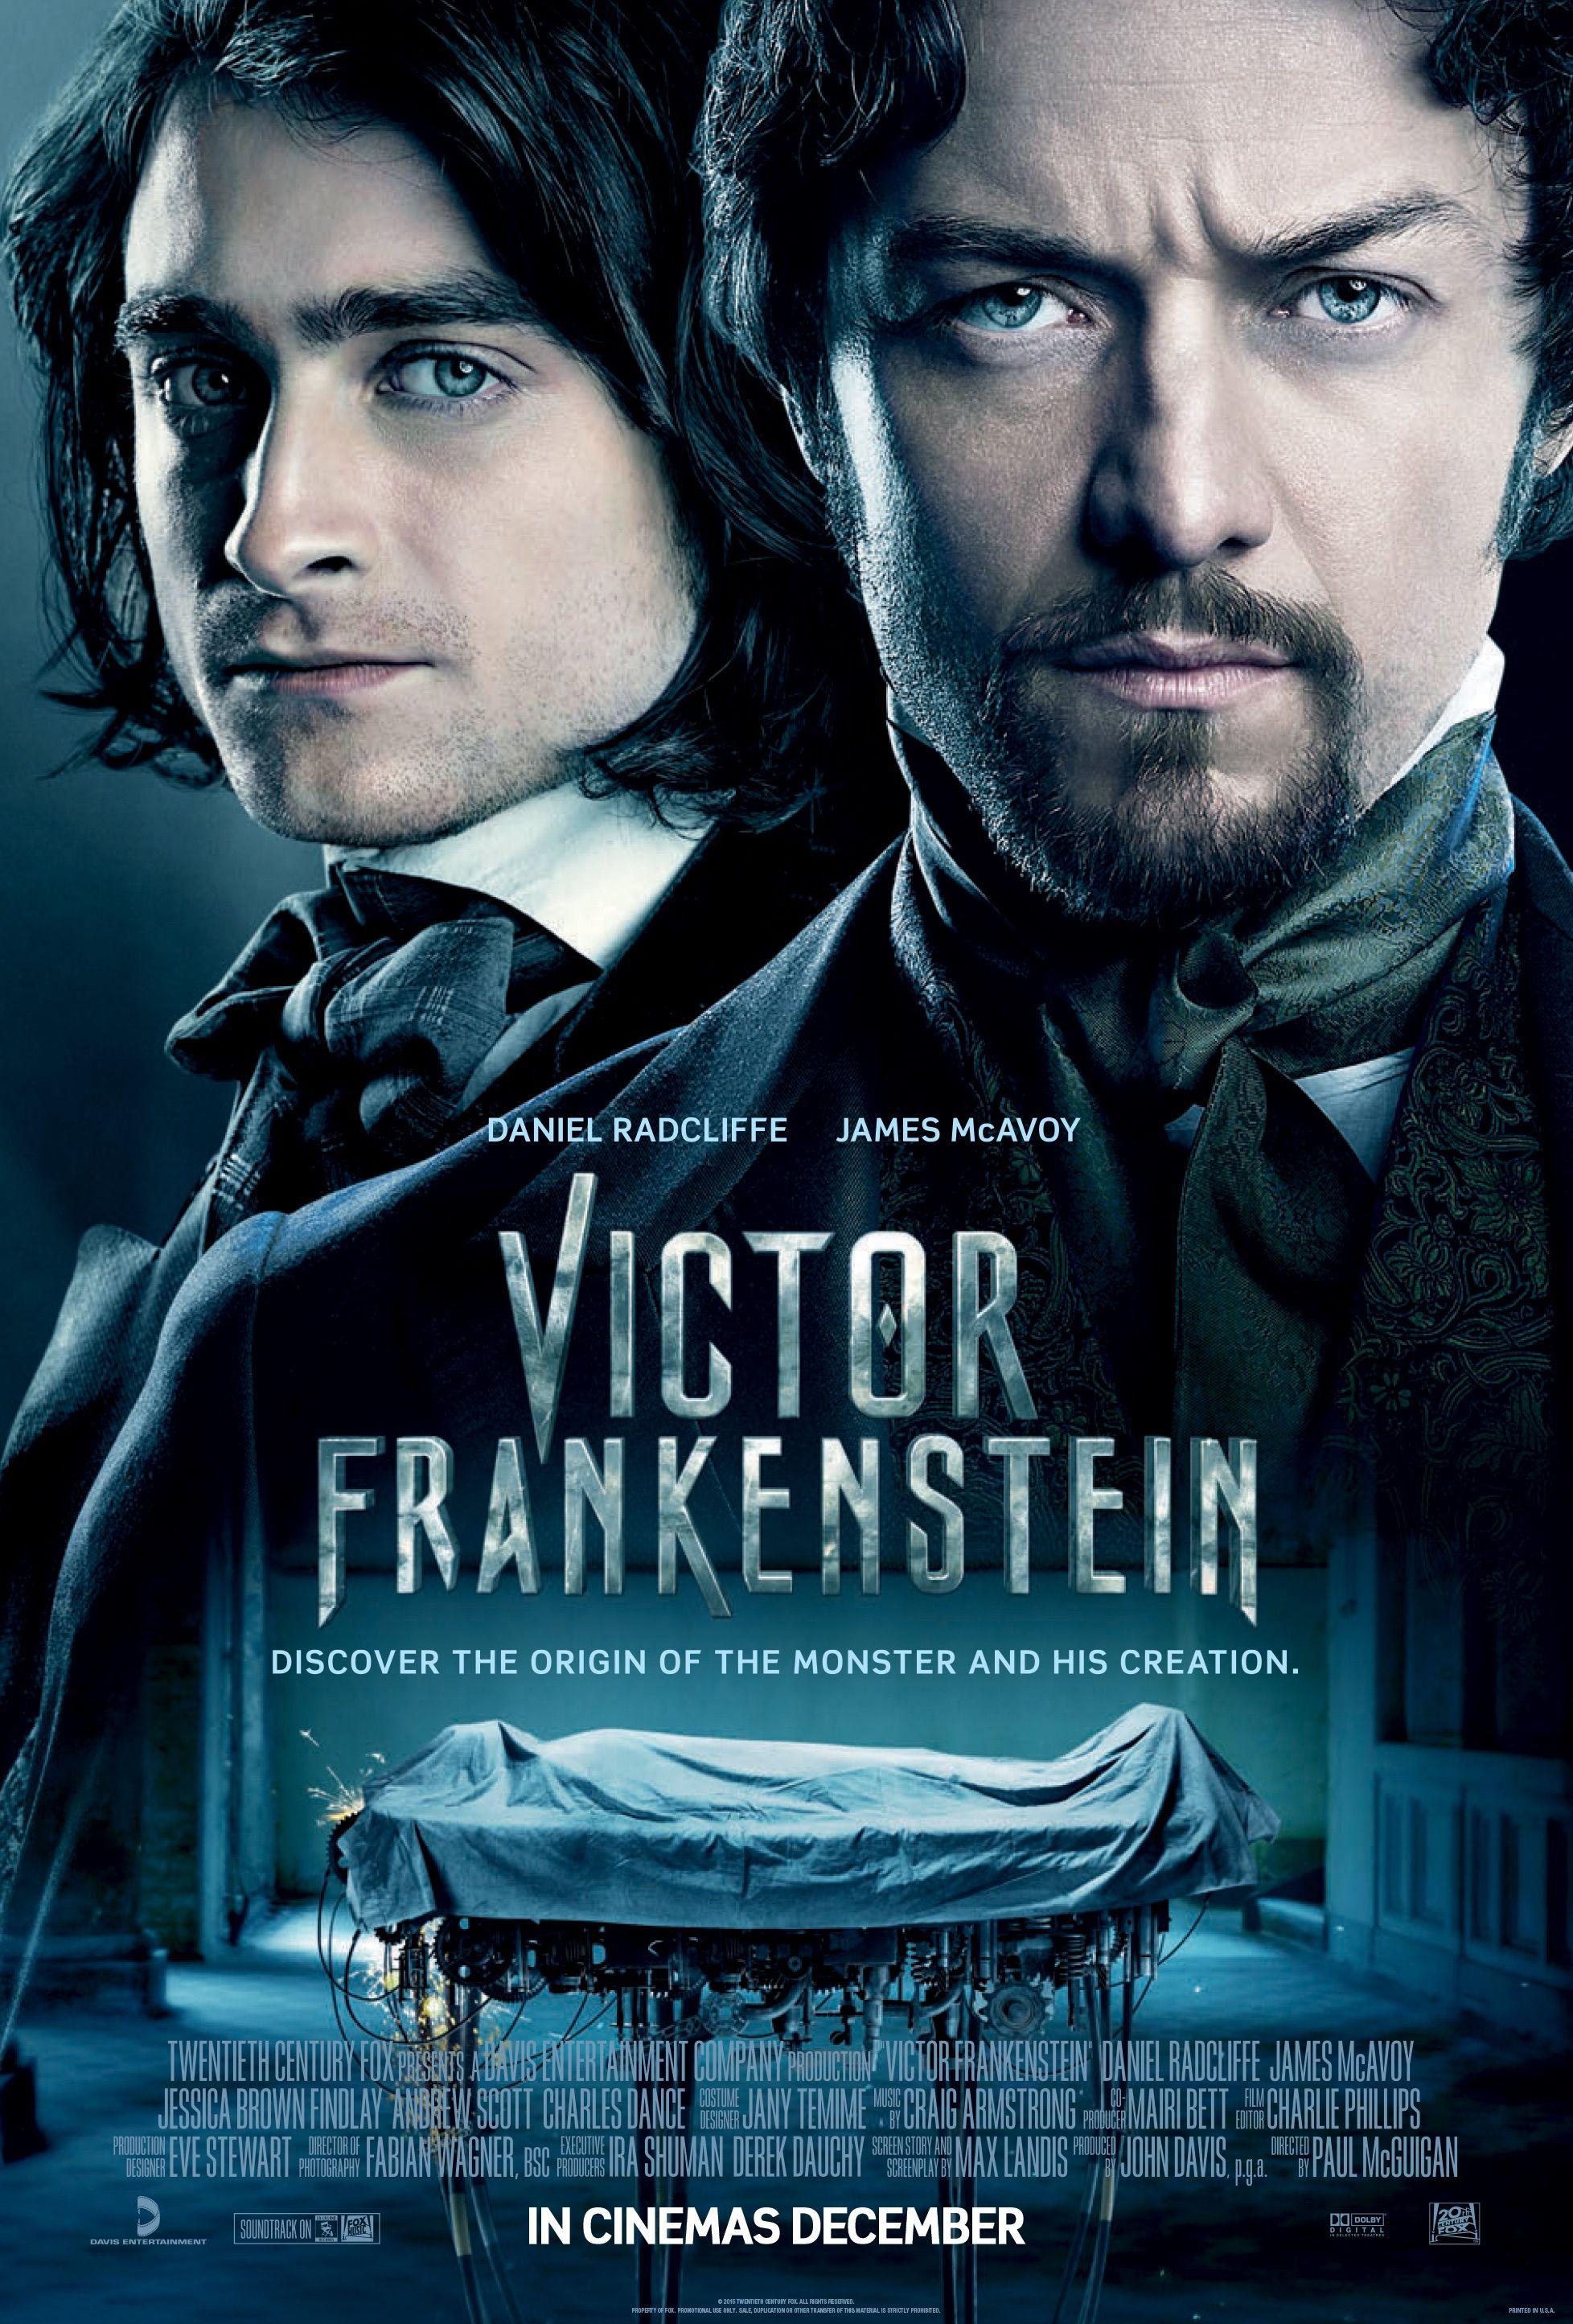 Victor Frankenstein #3